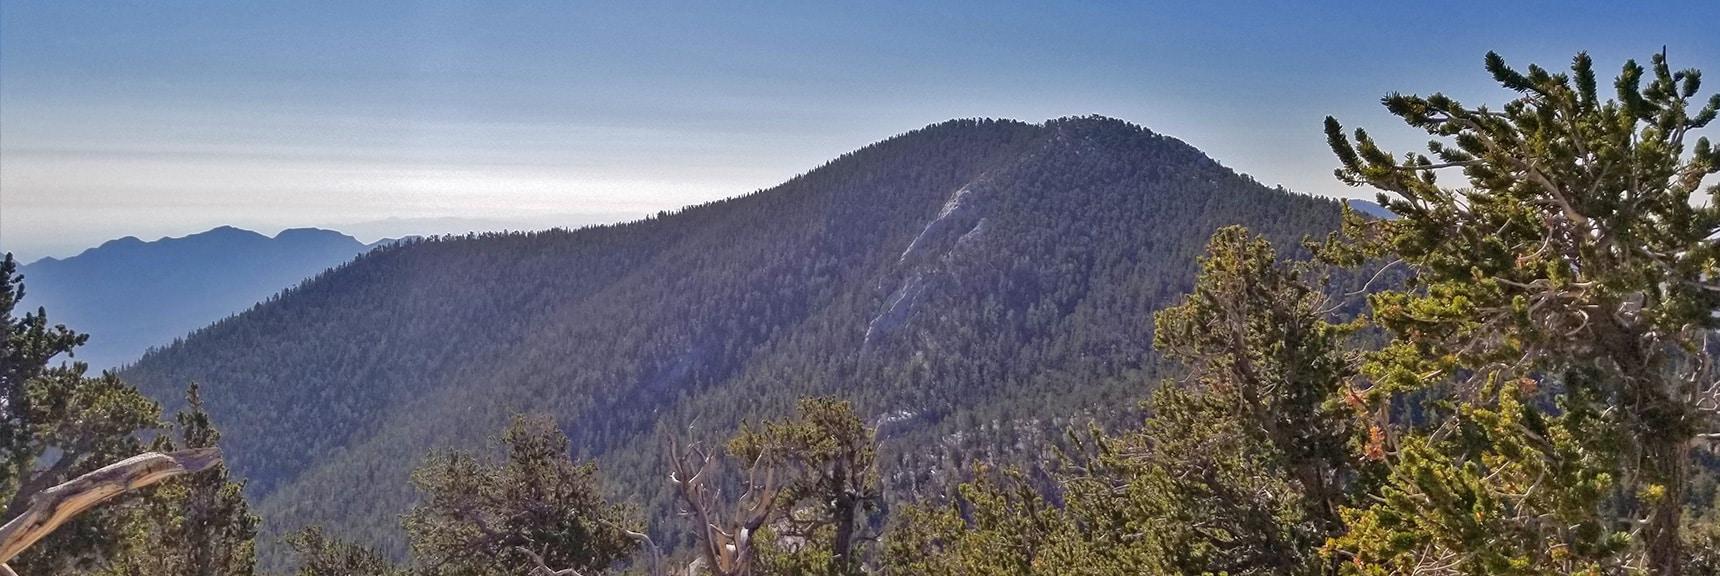 Fletcher Peak and La Madre Mountain Viewed from North Loop High Ridge | Mummy Springs Loop | Mt. Charleston Wilderness | Spring Mountains, Nevada